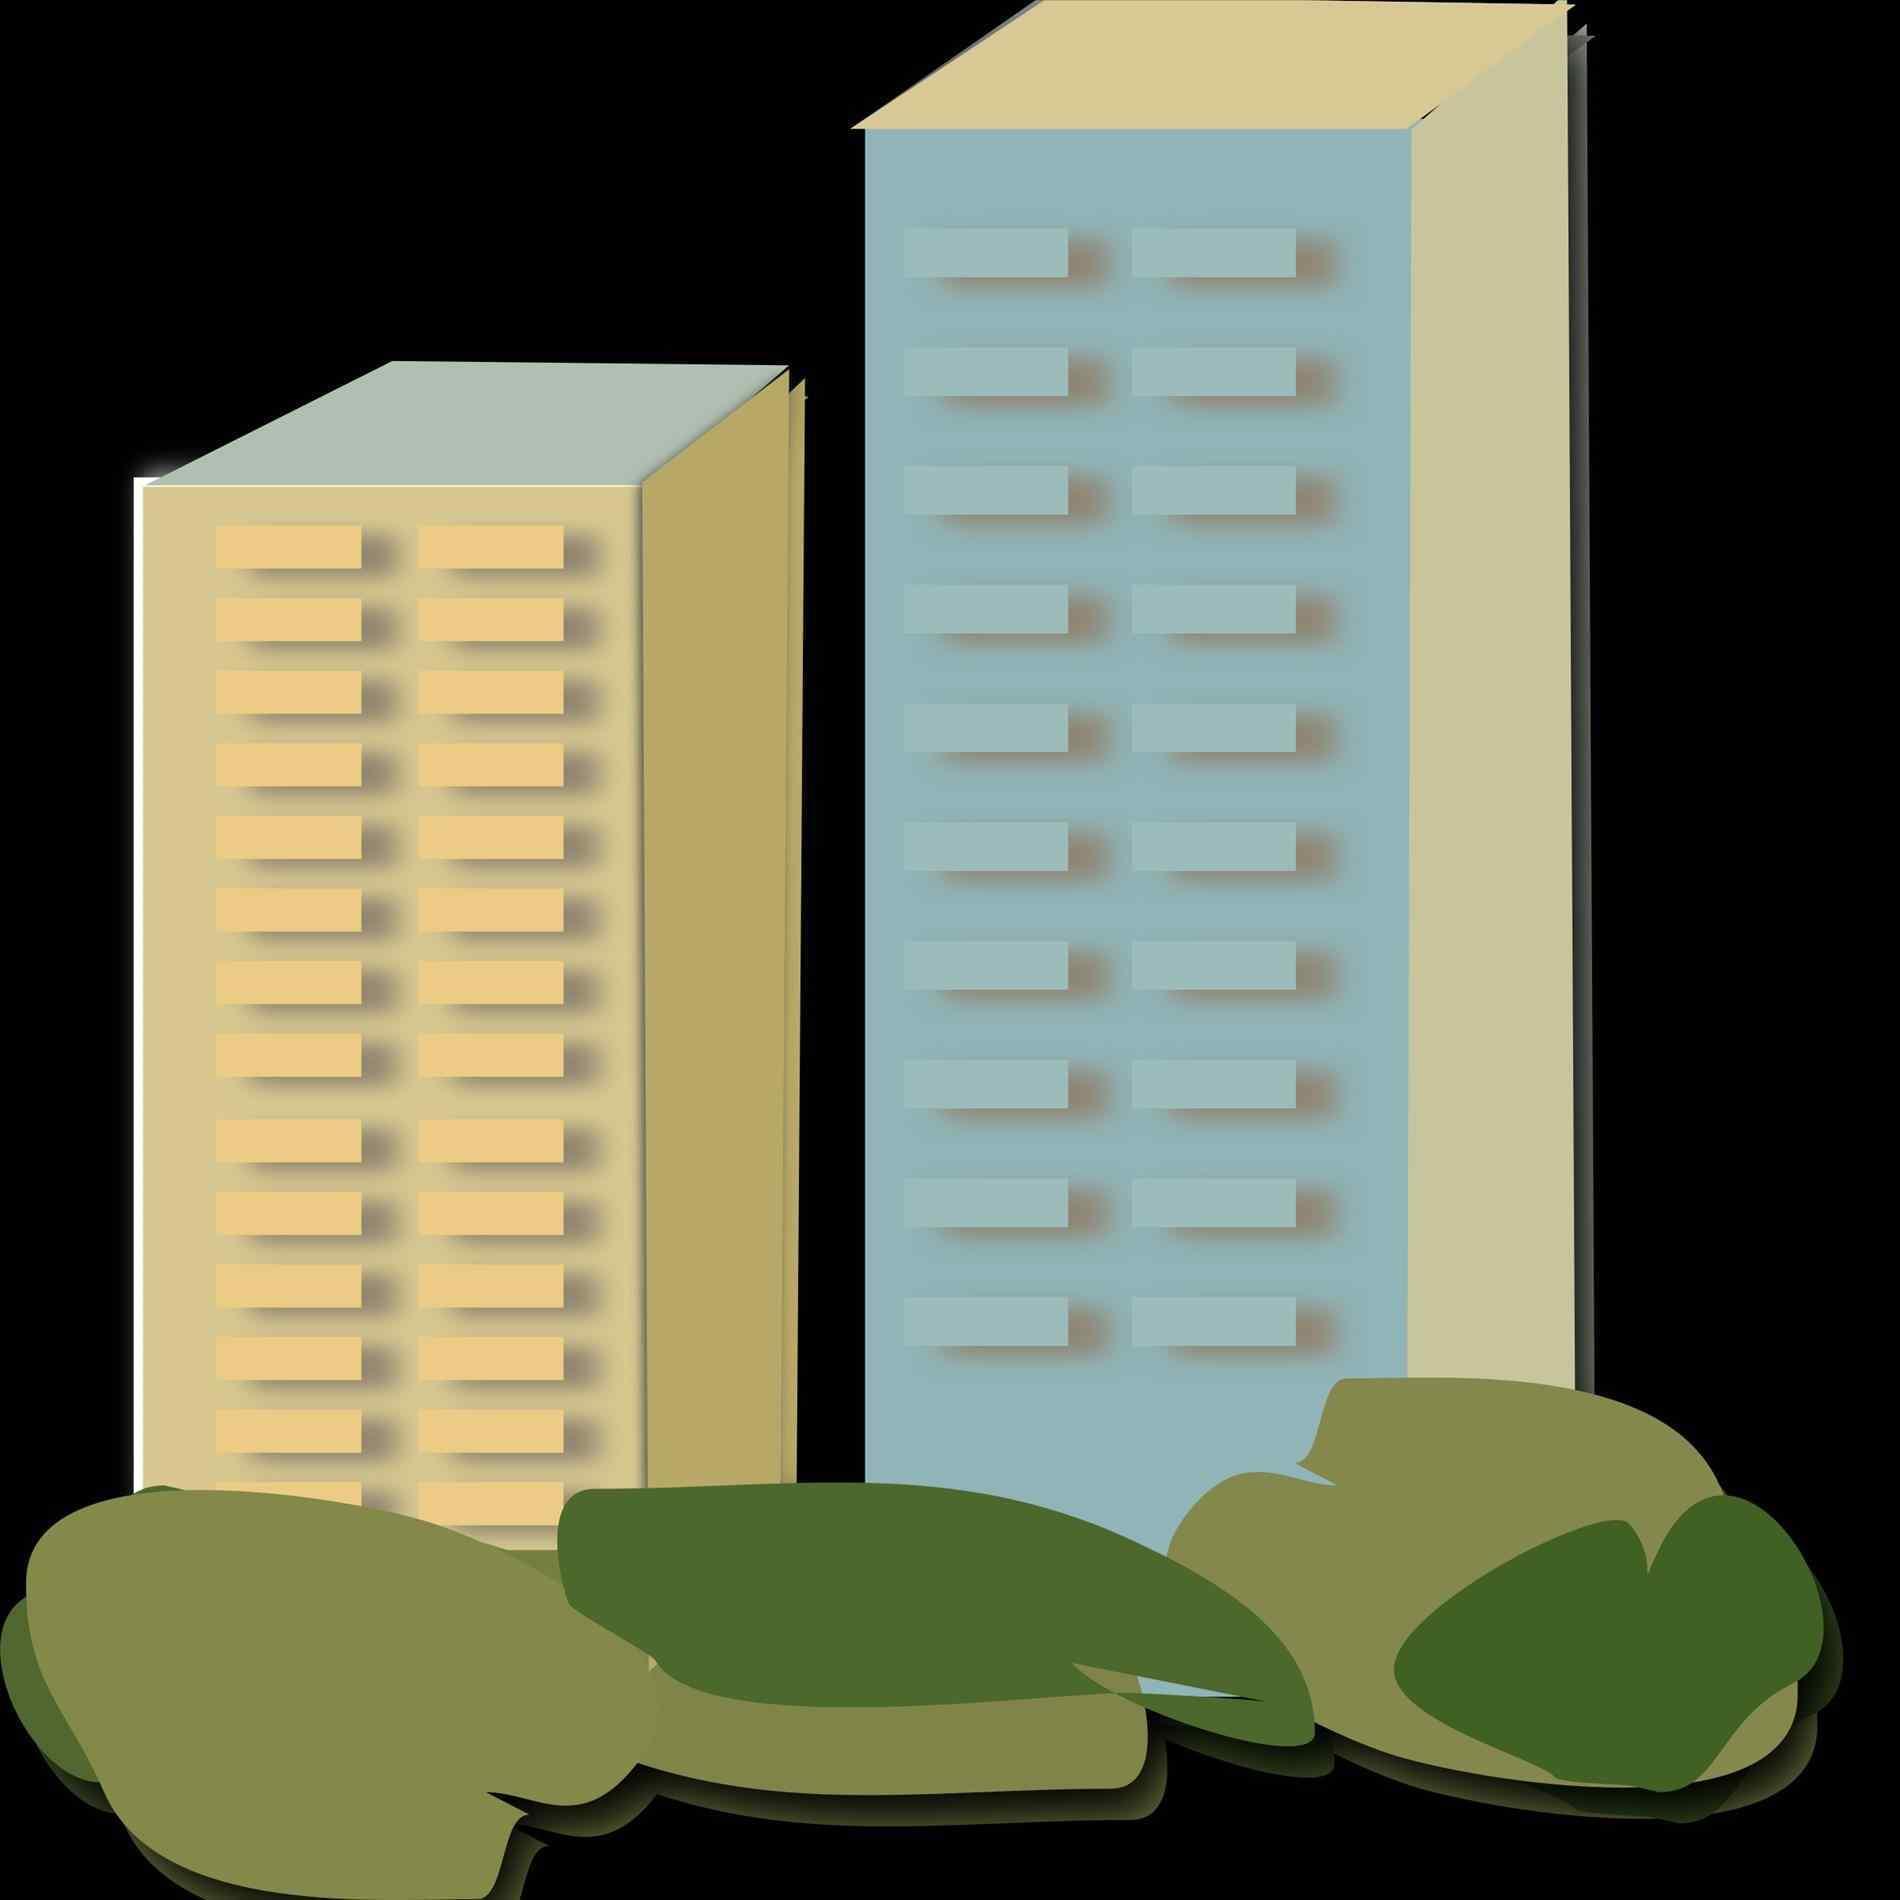 Apartments athelred com black. Apartment clipart apt